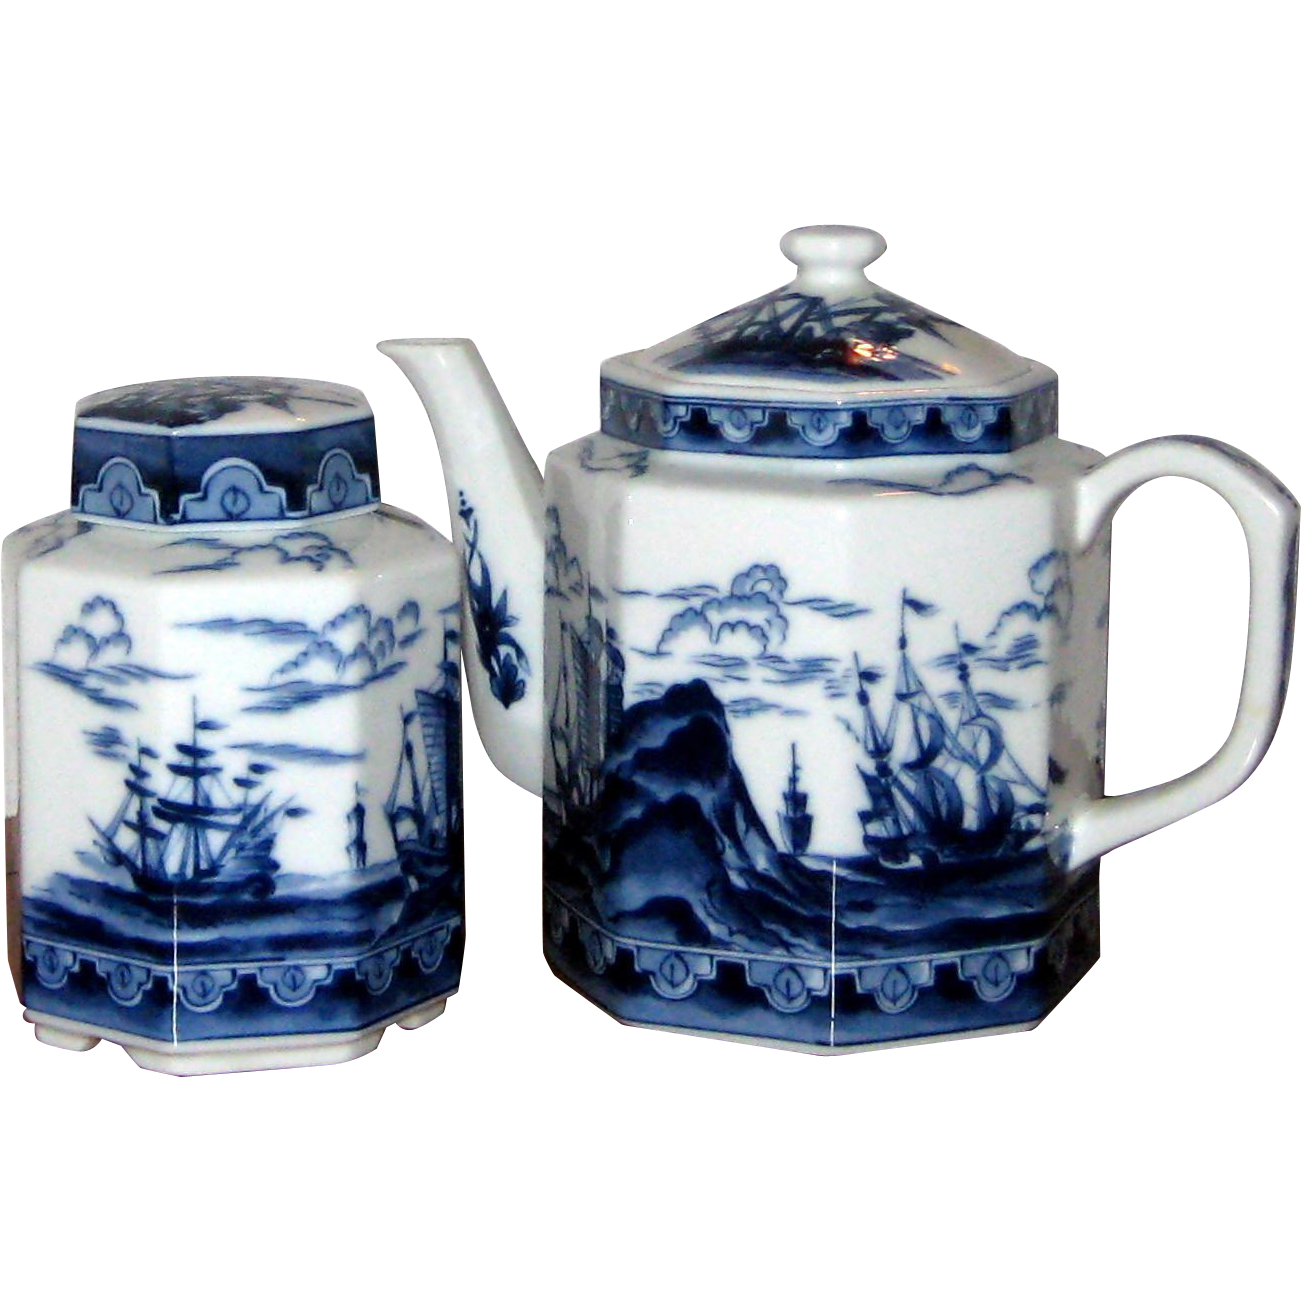 Andrea by Sadek Maritime Nautical Theme Teapot and Tea Caddy